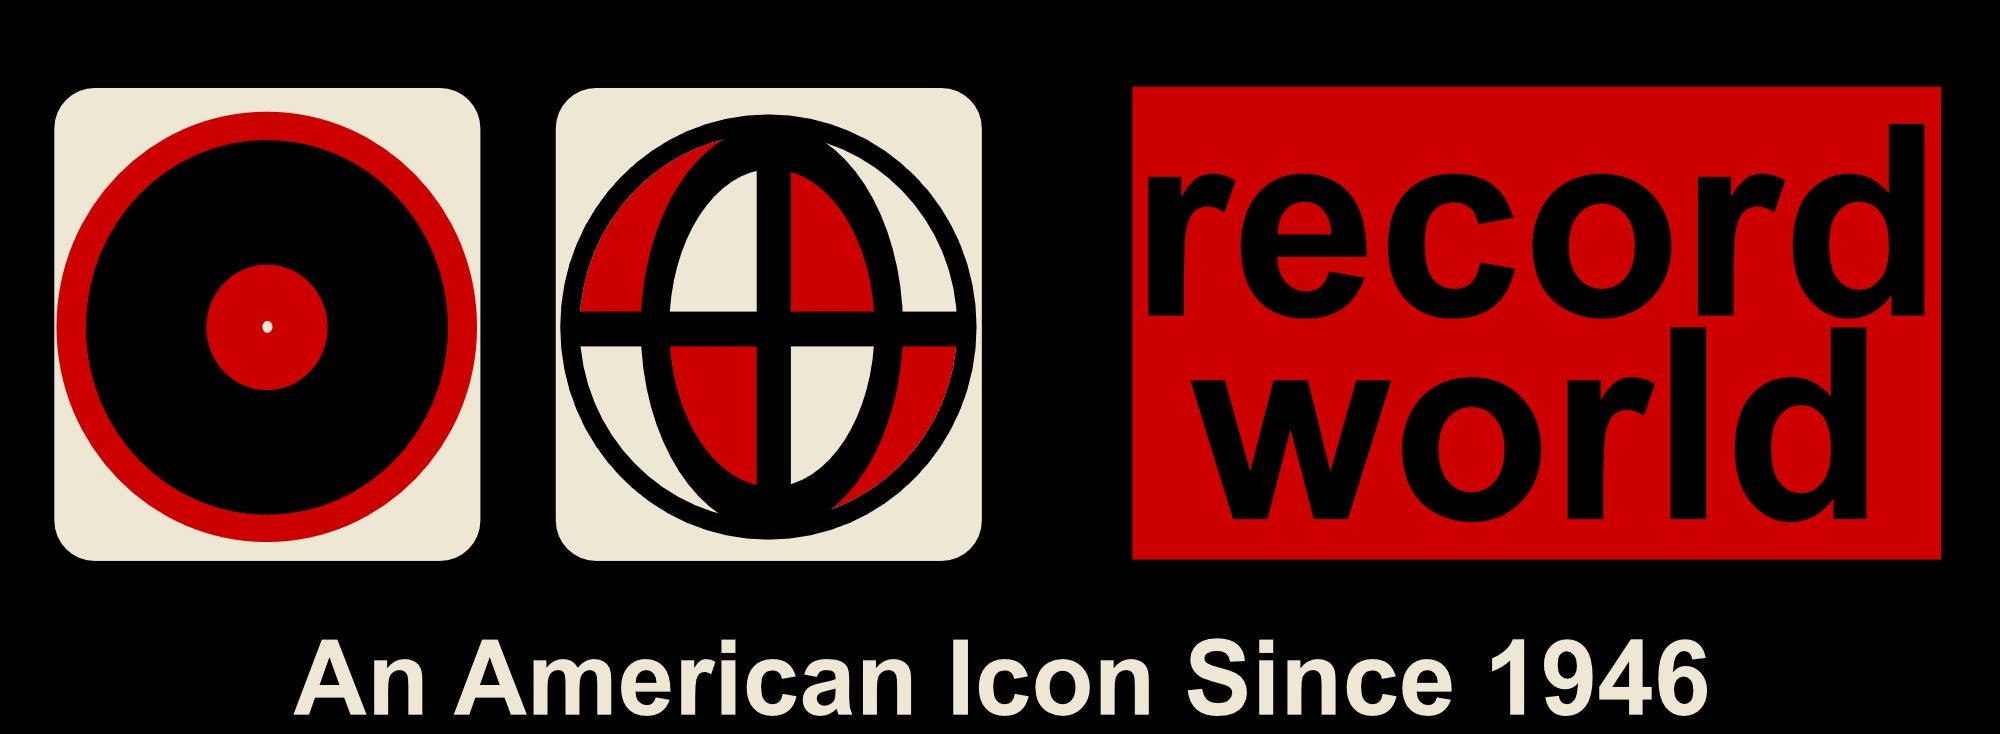 Record world